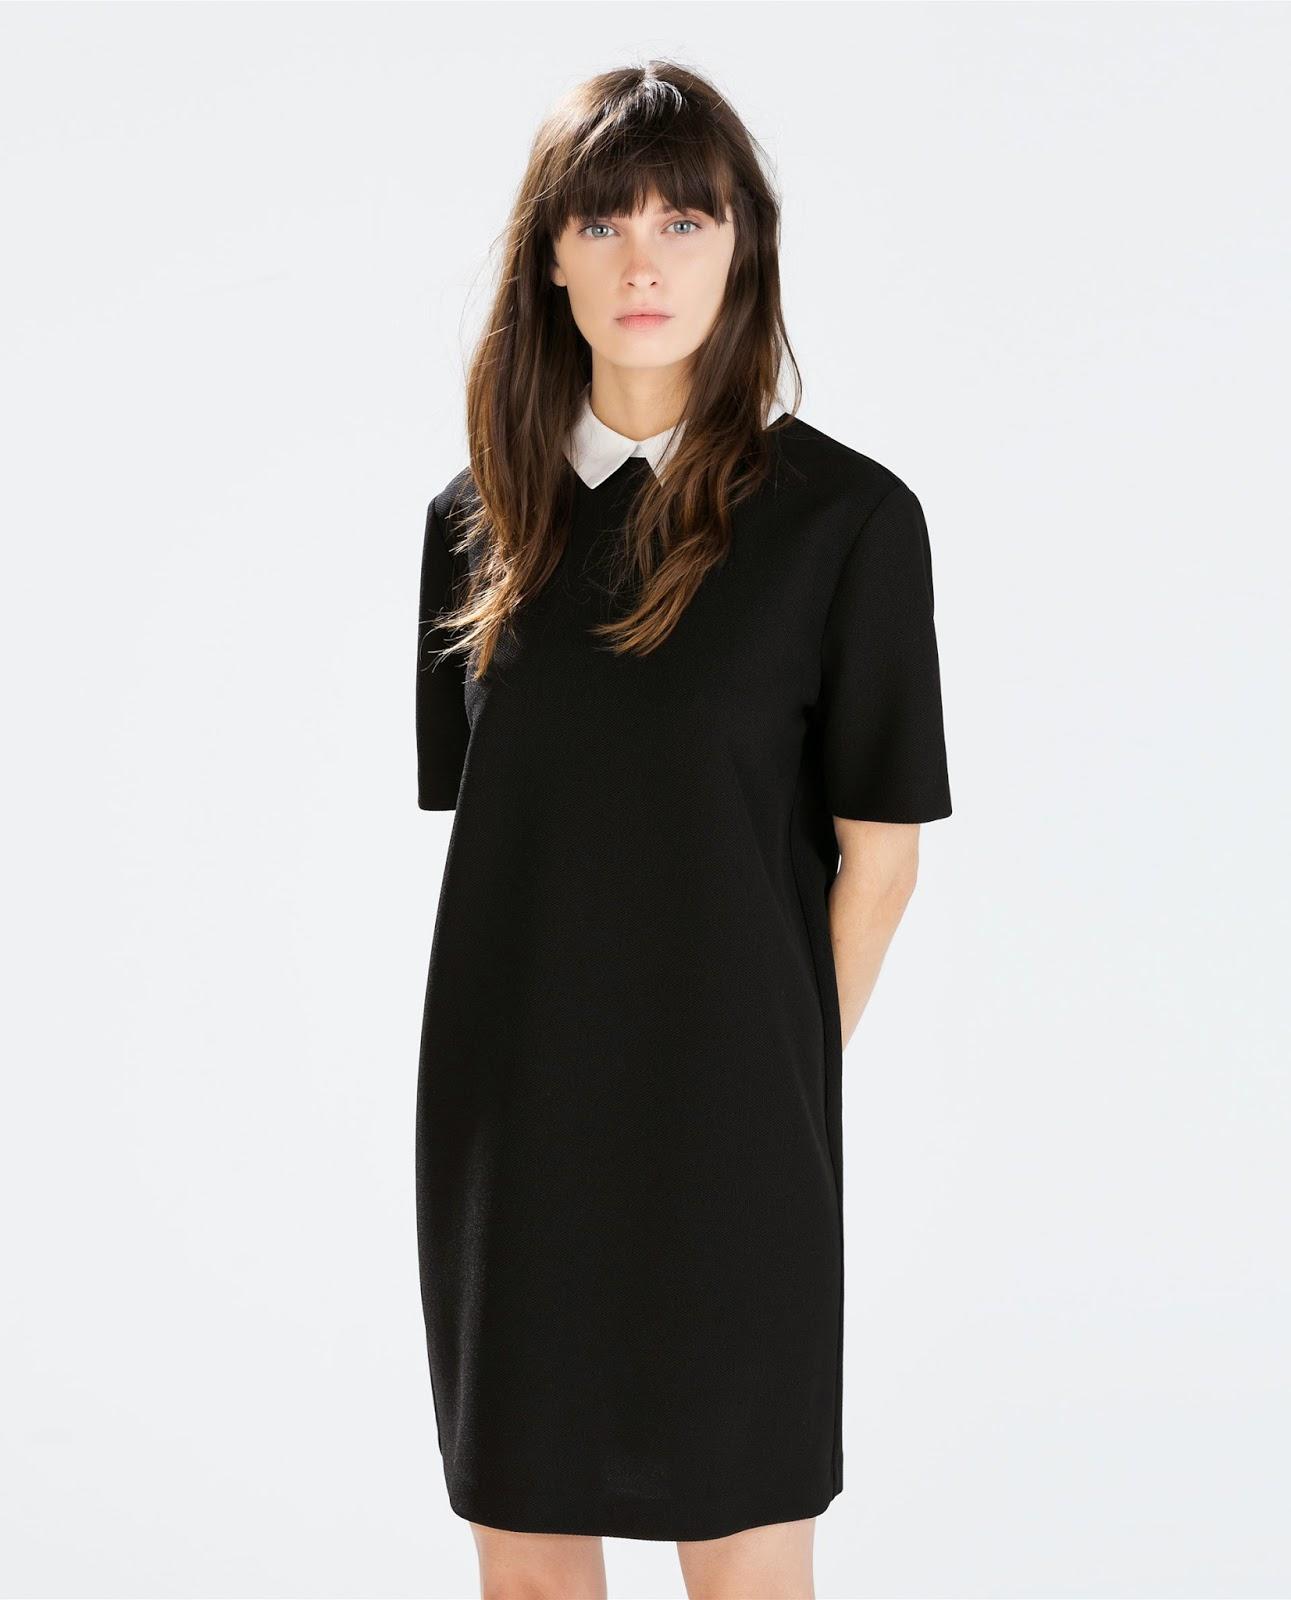 zara black dress with white collar